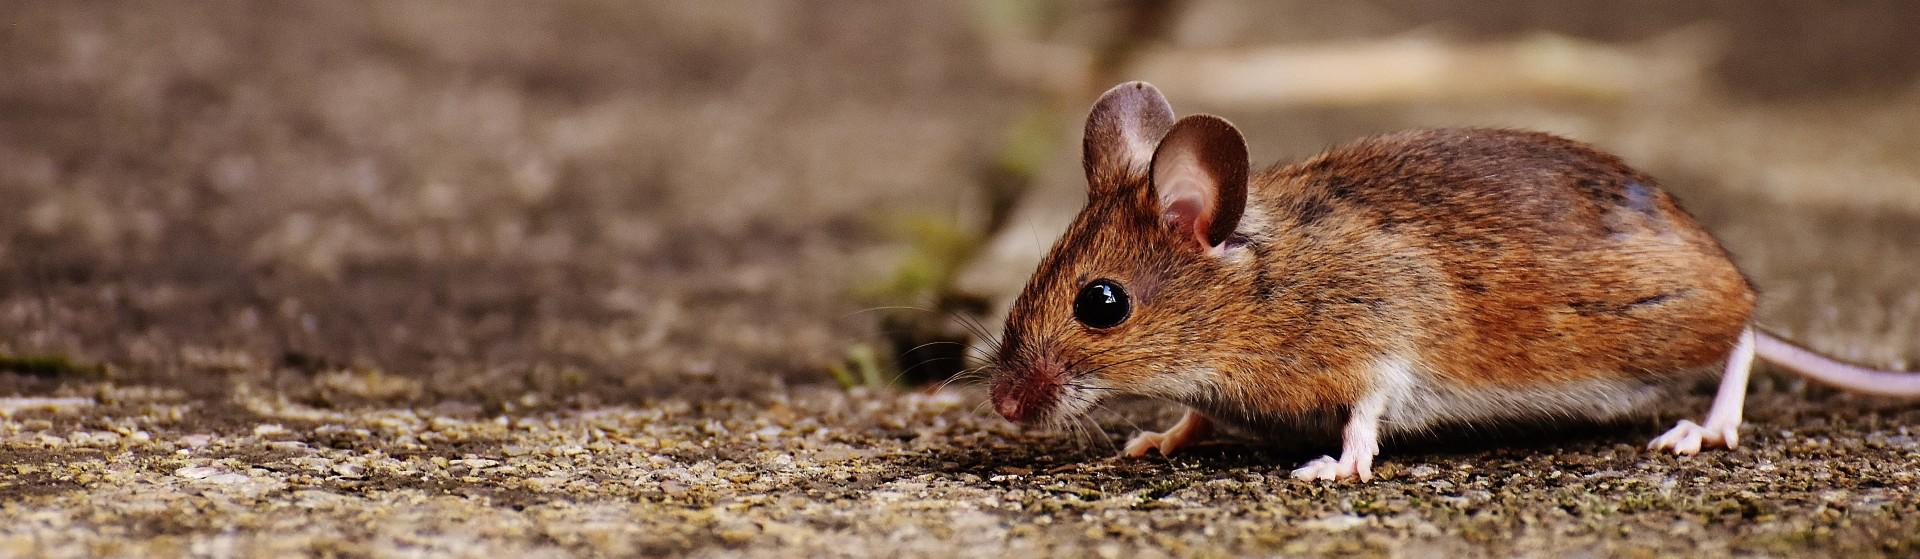 field mouse lanscape view